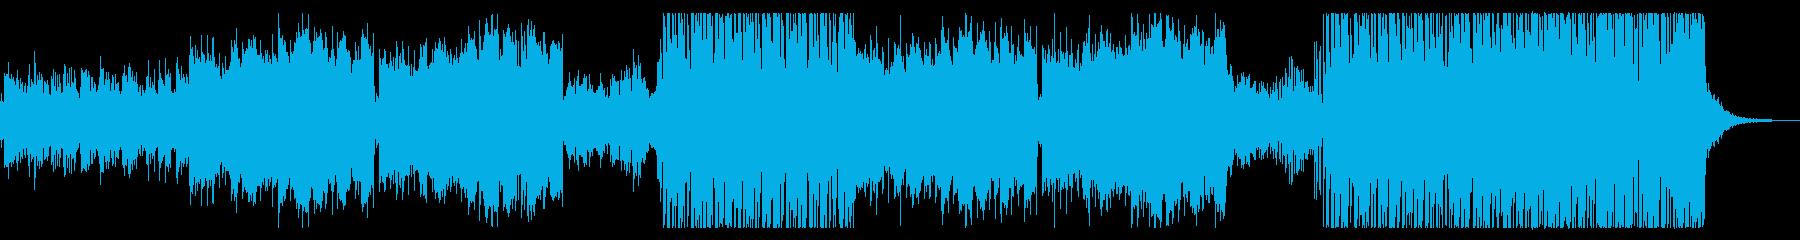 Phu Quocの再生済みの波形